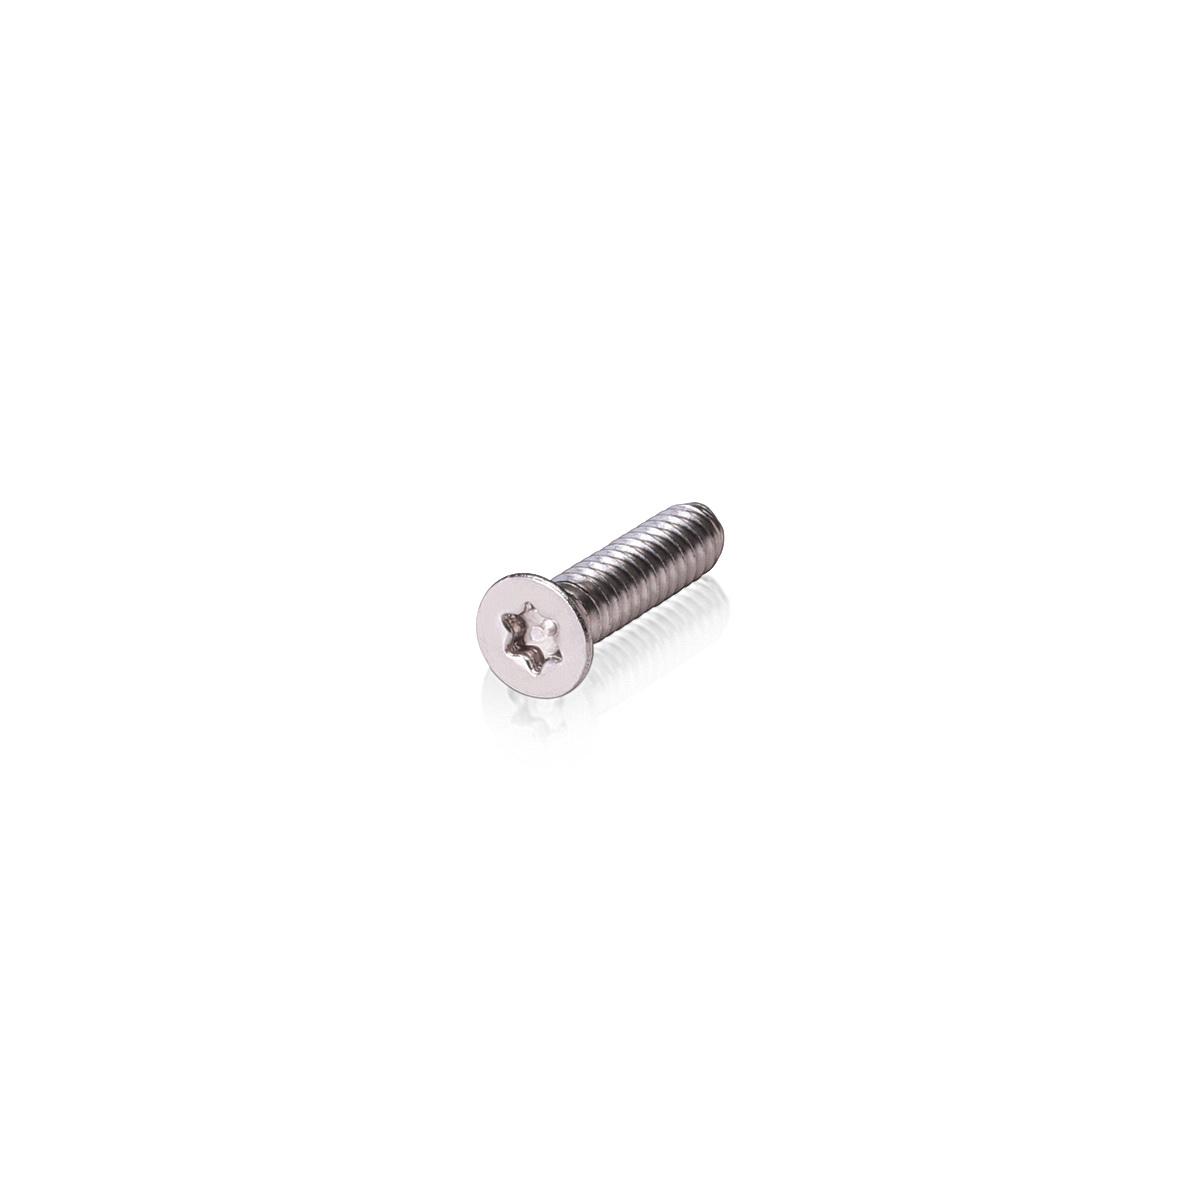 #10-24 x 3/4''   Torx   Flat Head   Machine Screws   Stainless Steel 18-8